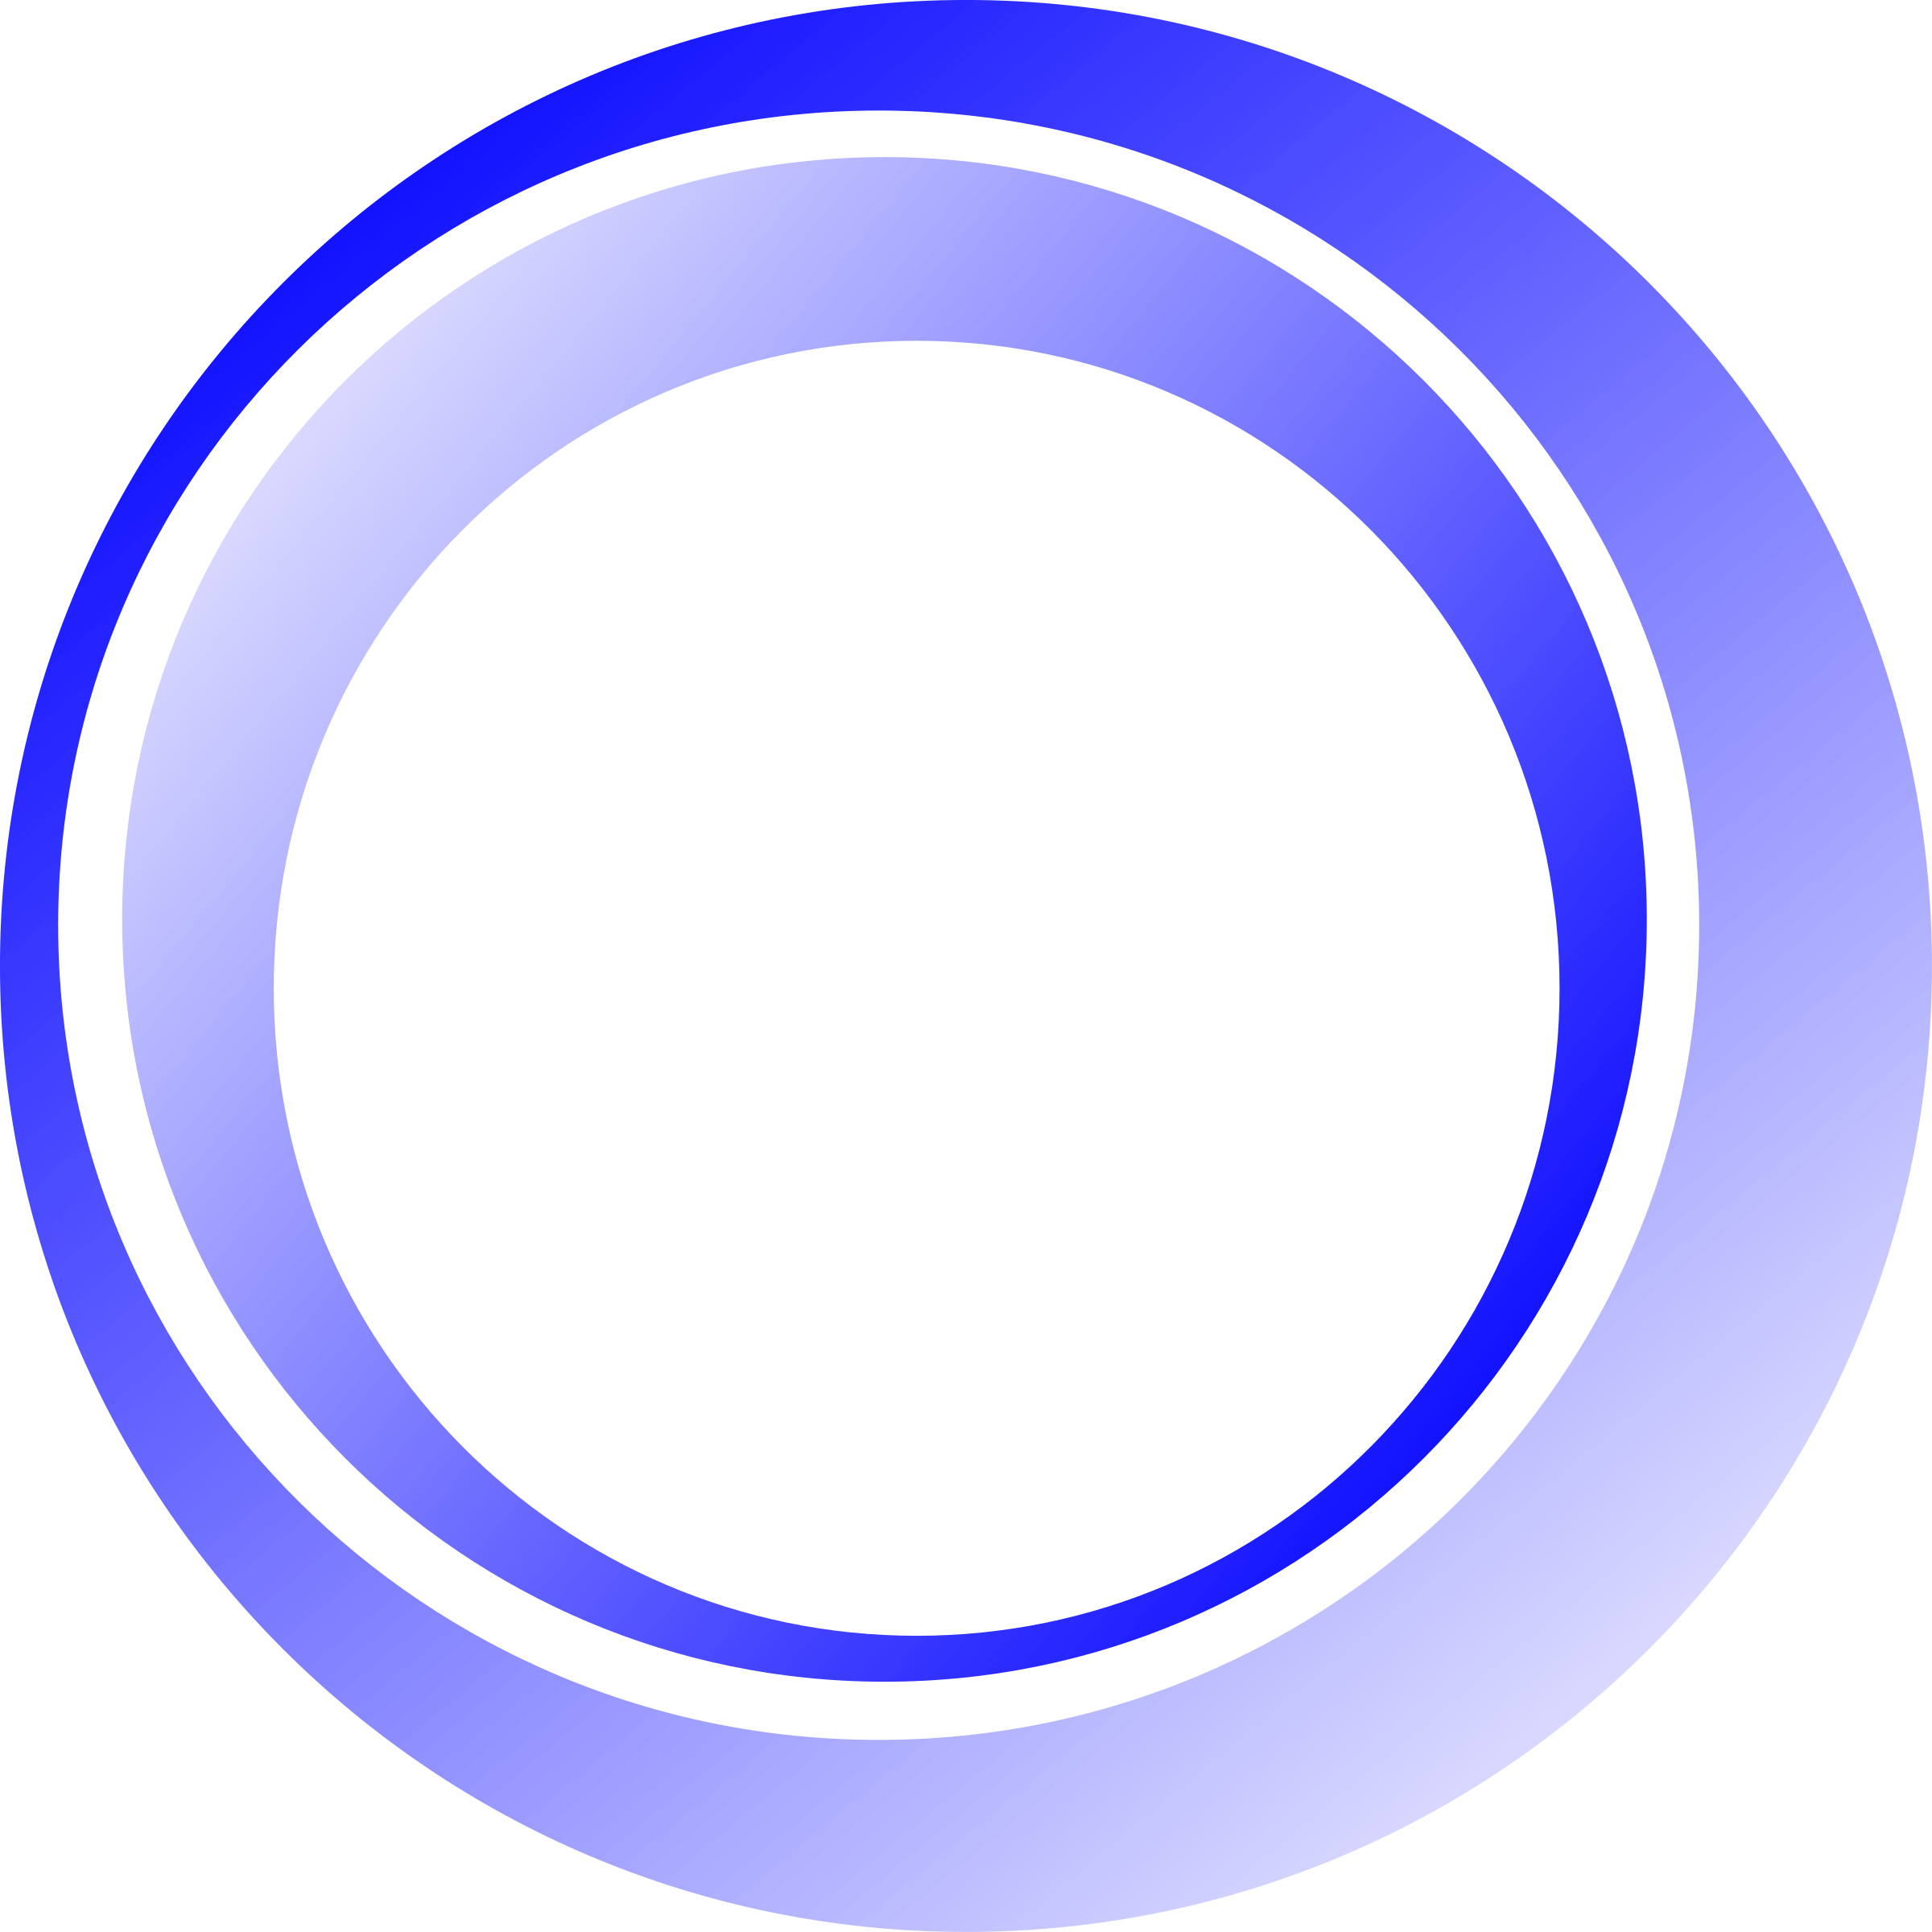 3D Blue Circle Png